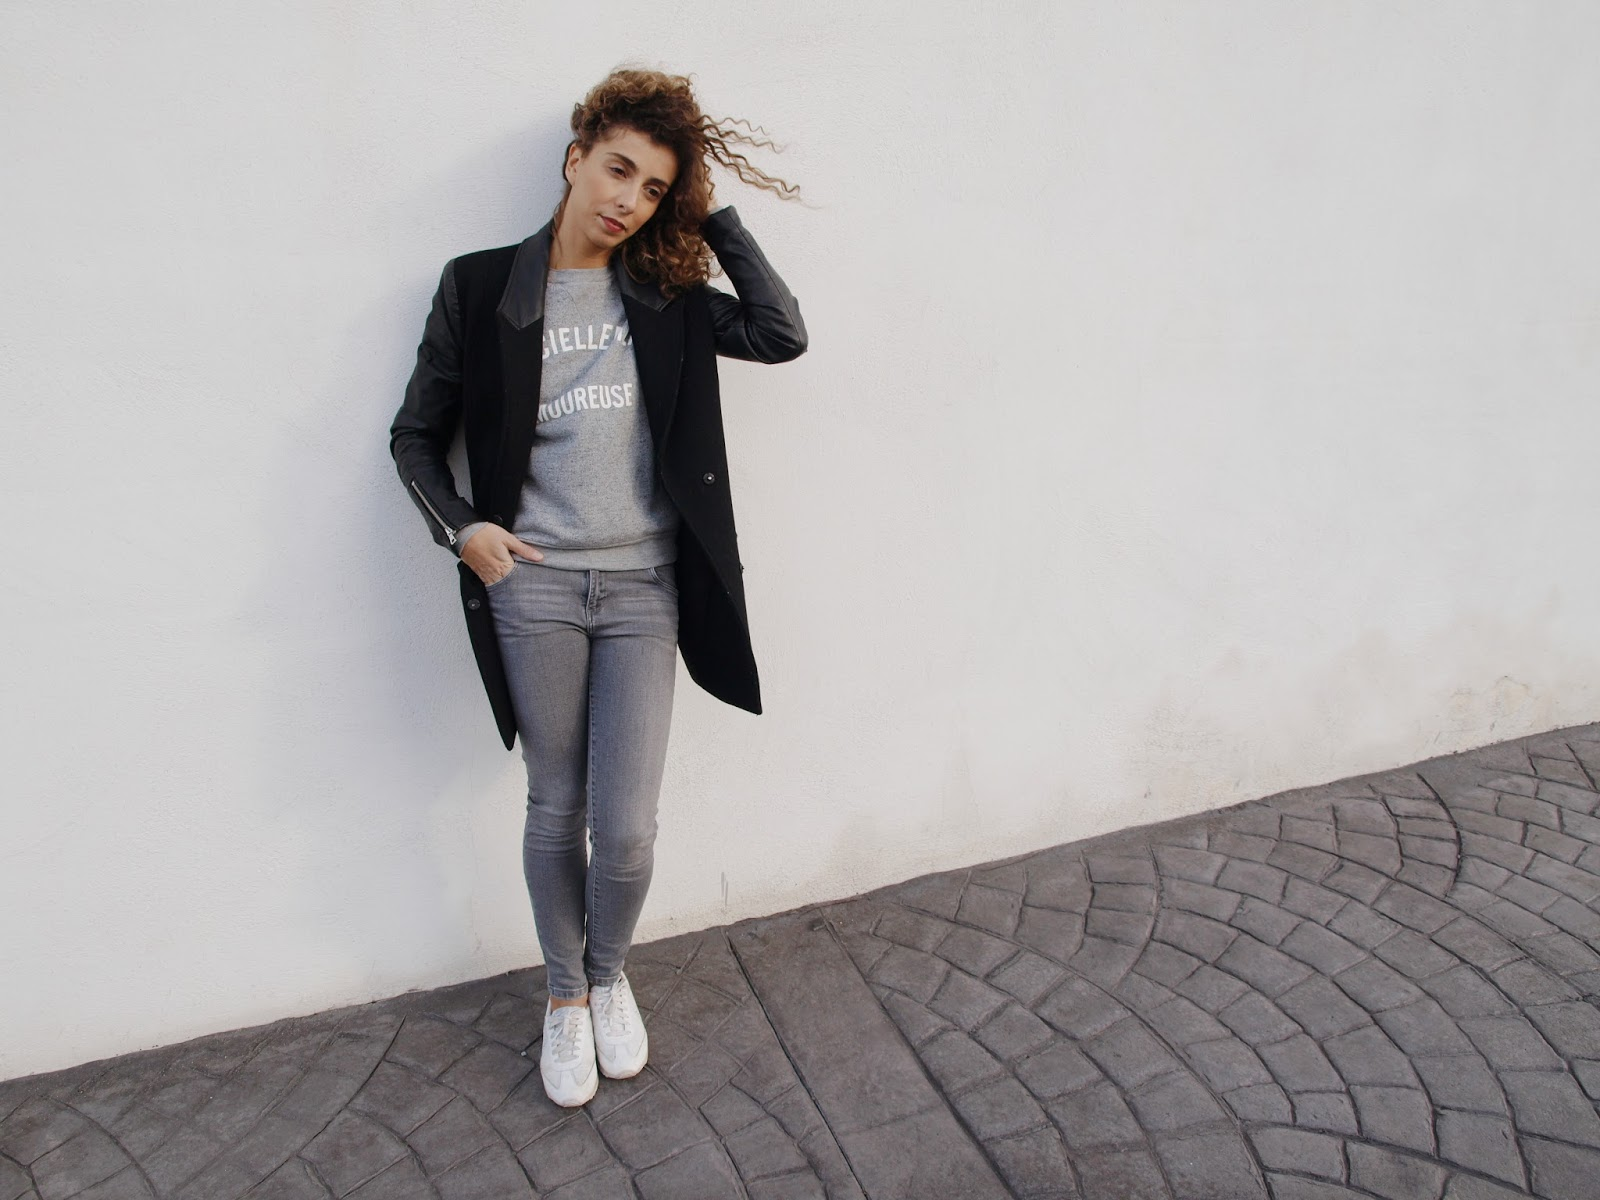 jean-skinny-coat-zara-cachecache-campingdesdeuxjumeaux-nike-white-minimal